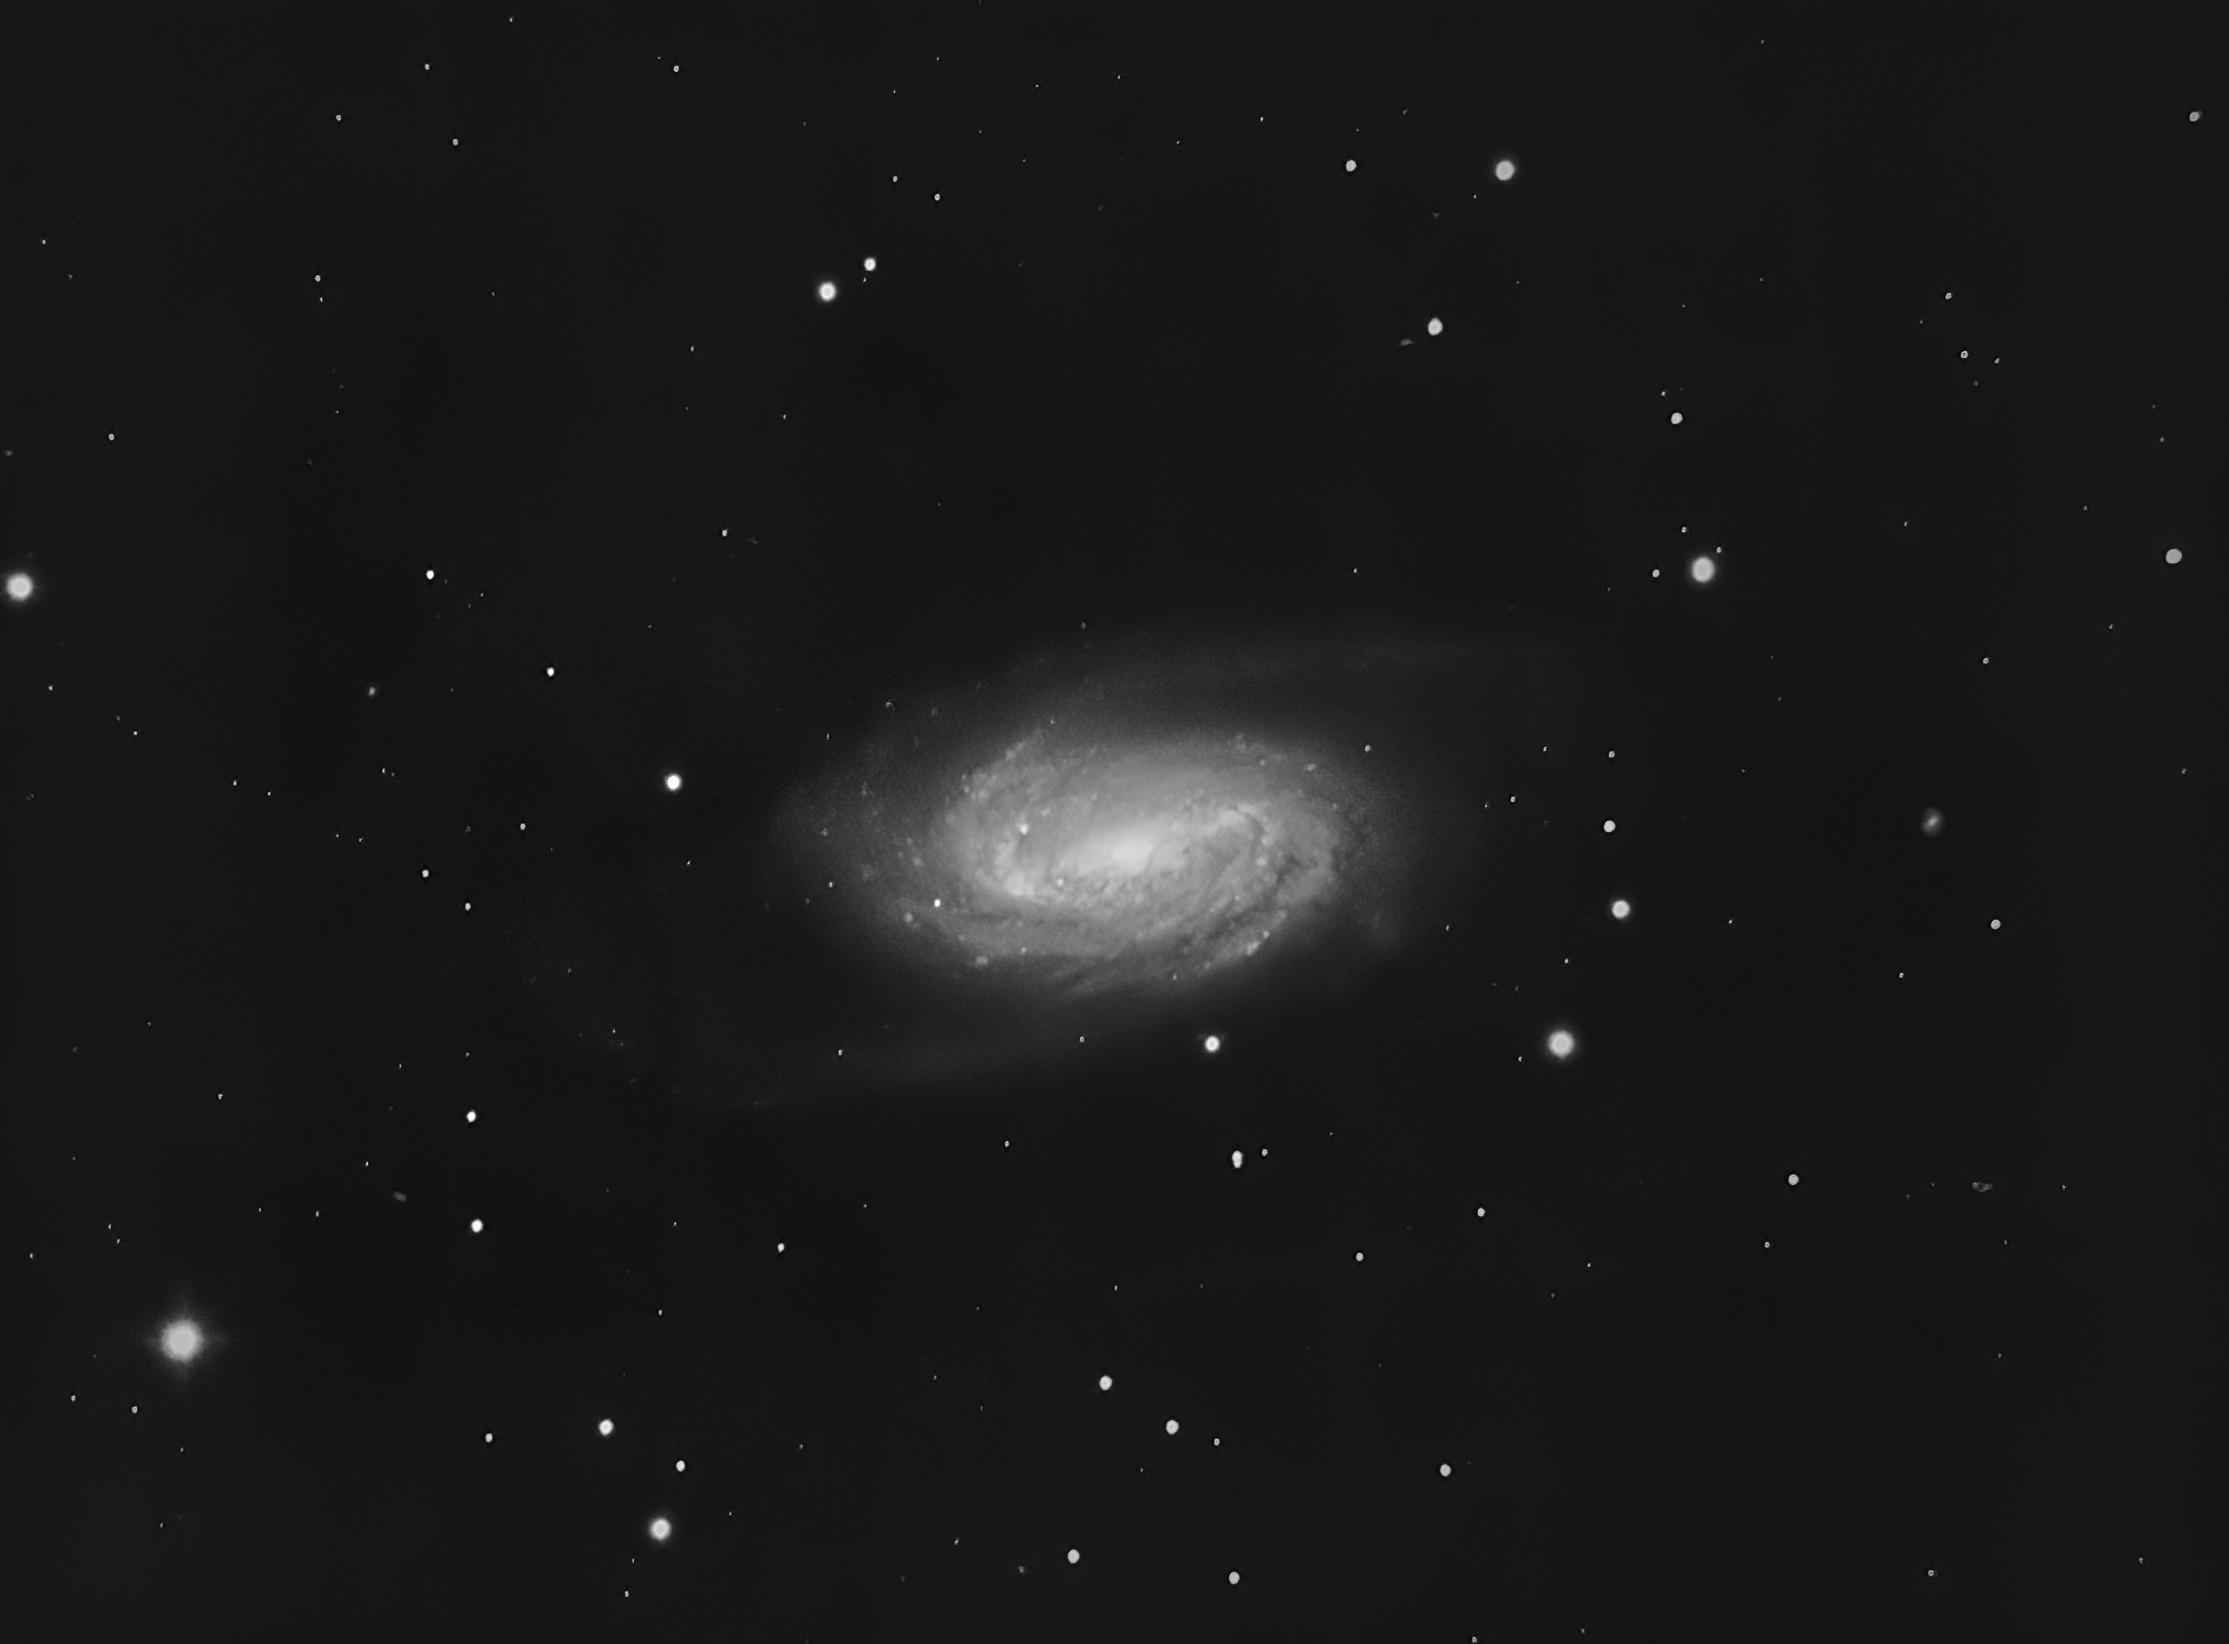 NGC 2903 Lucky Imaging